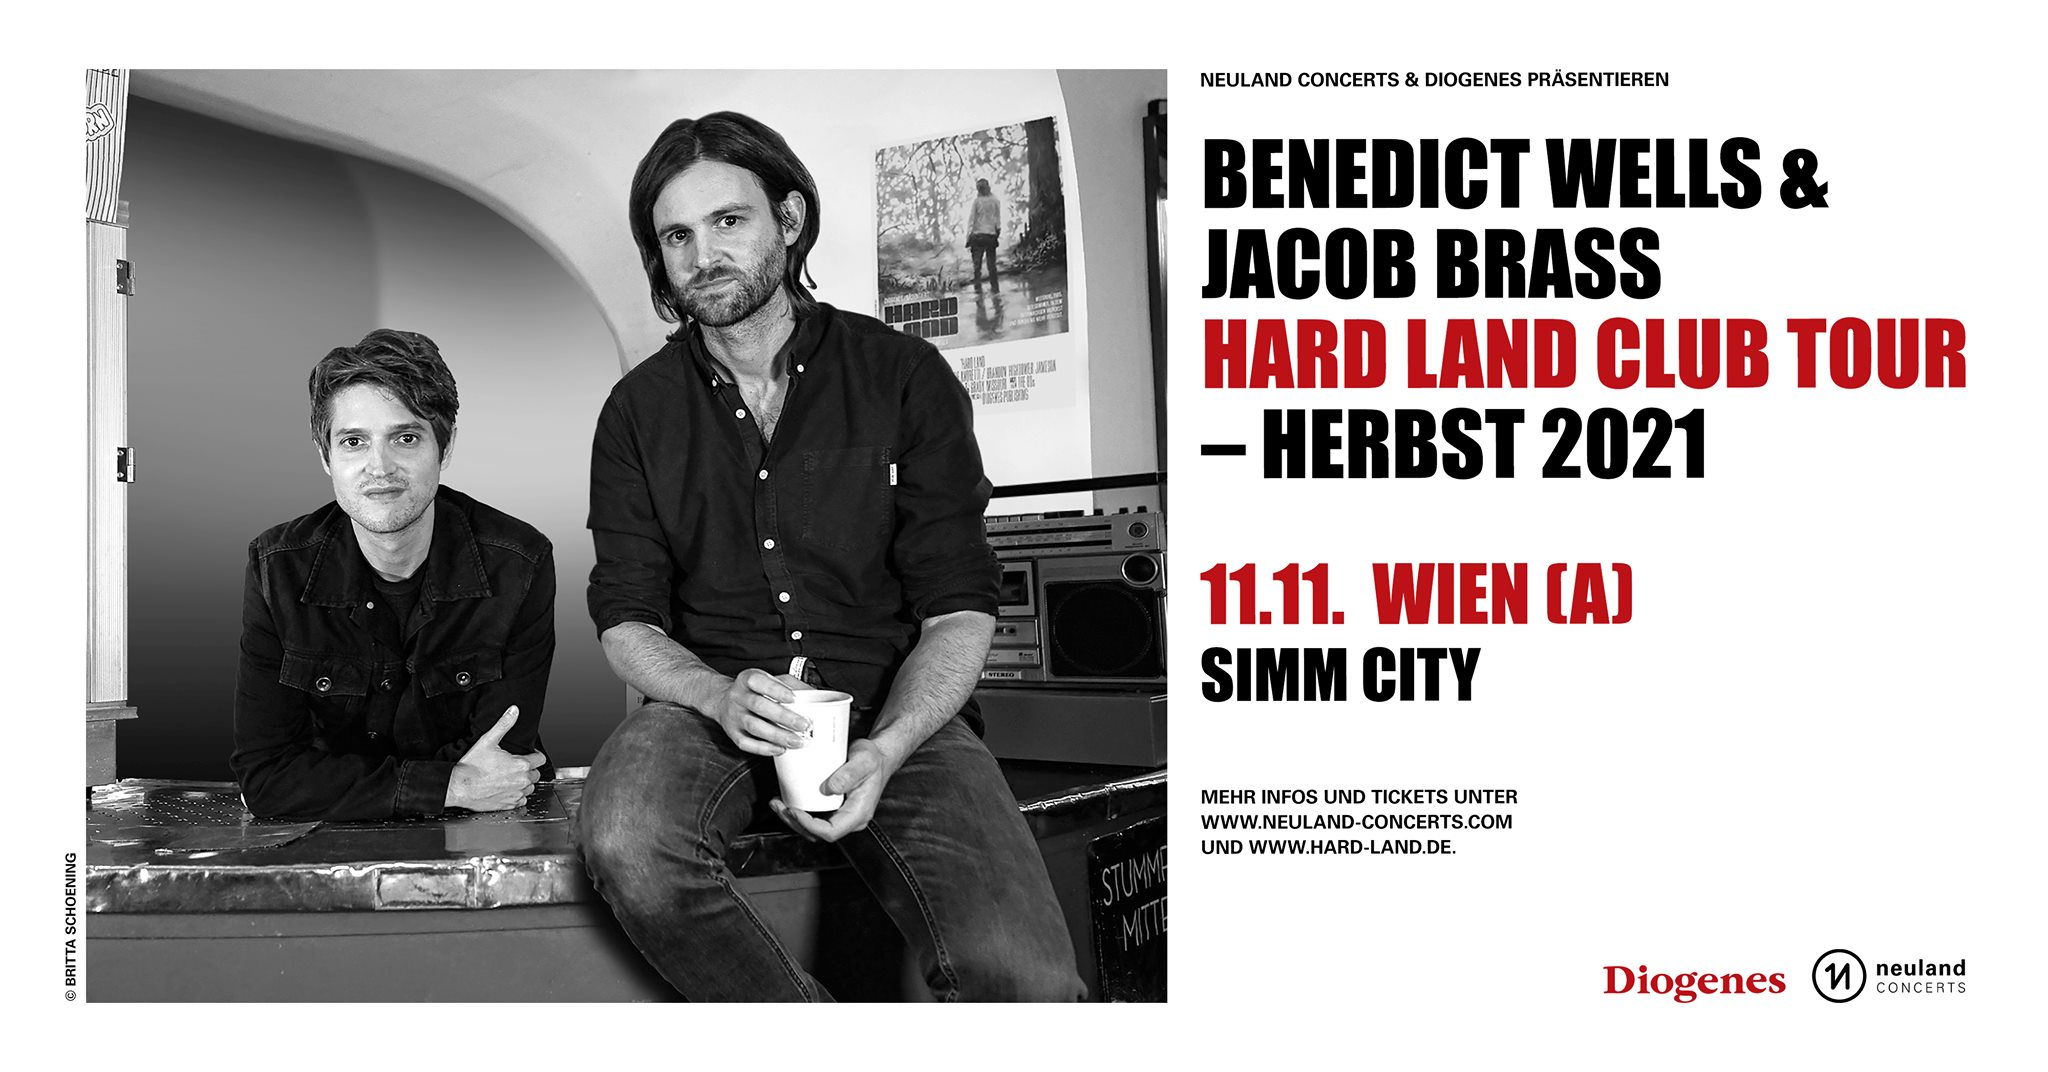 Benedict Wells & Jacob Brass am 11. November 2021 @ Simm City.